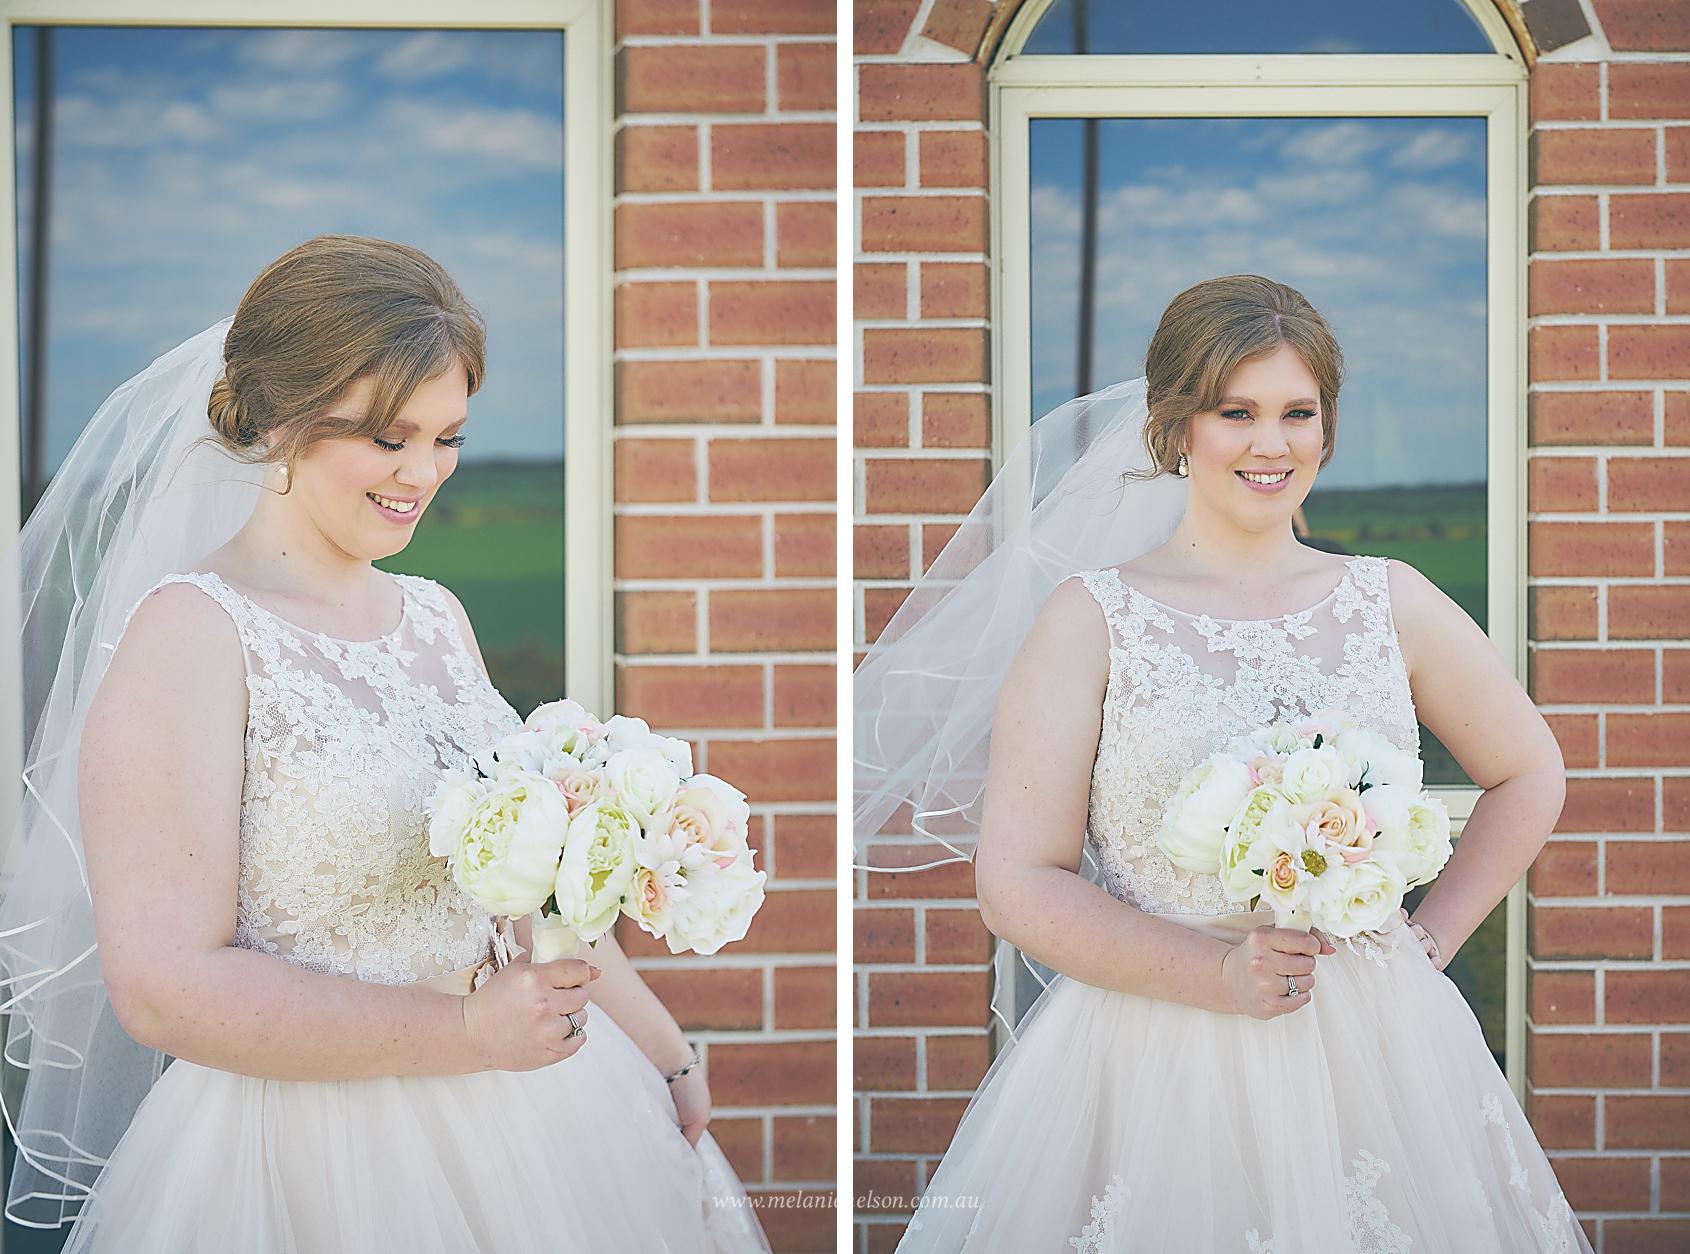 yorke_peninsula_wedding_photographer_0021.jpg